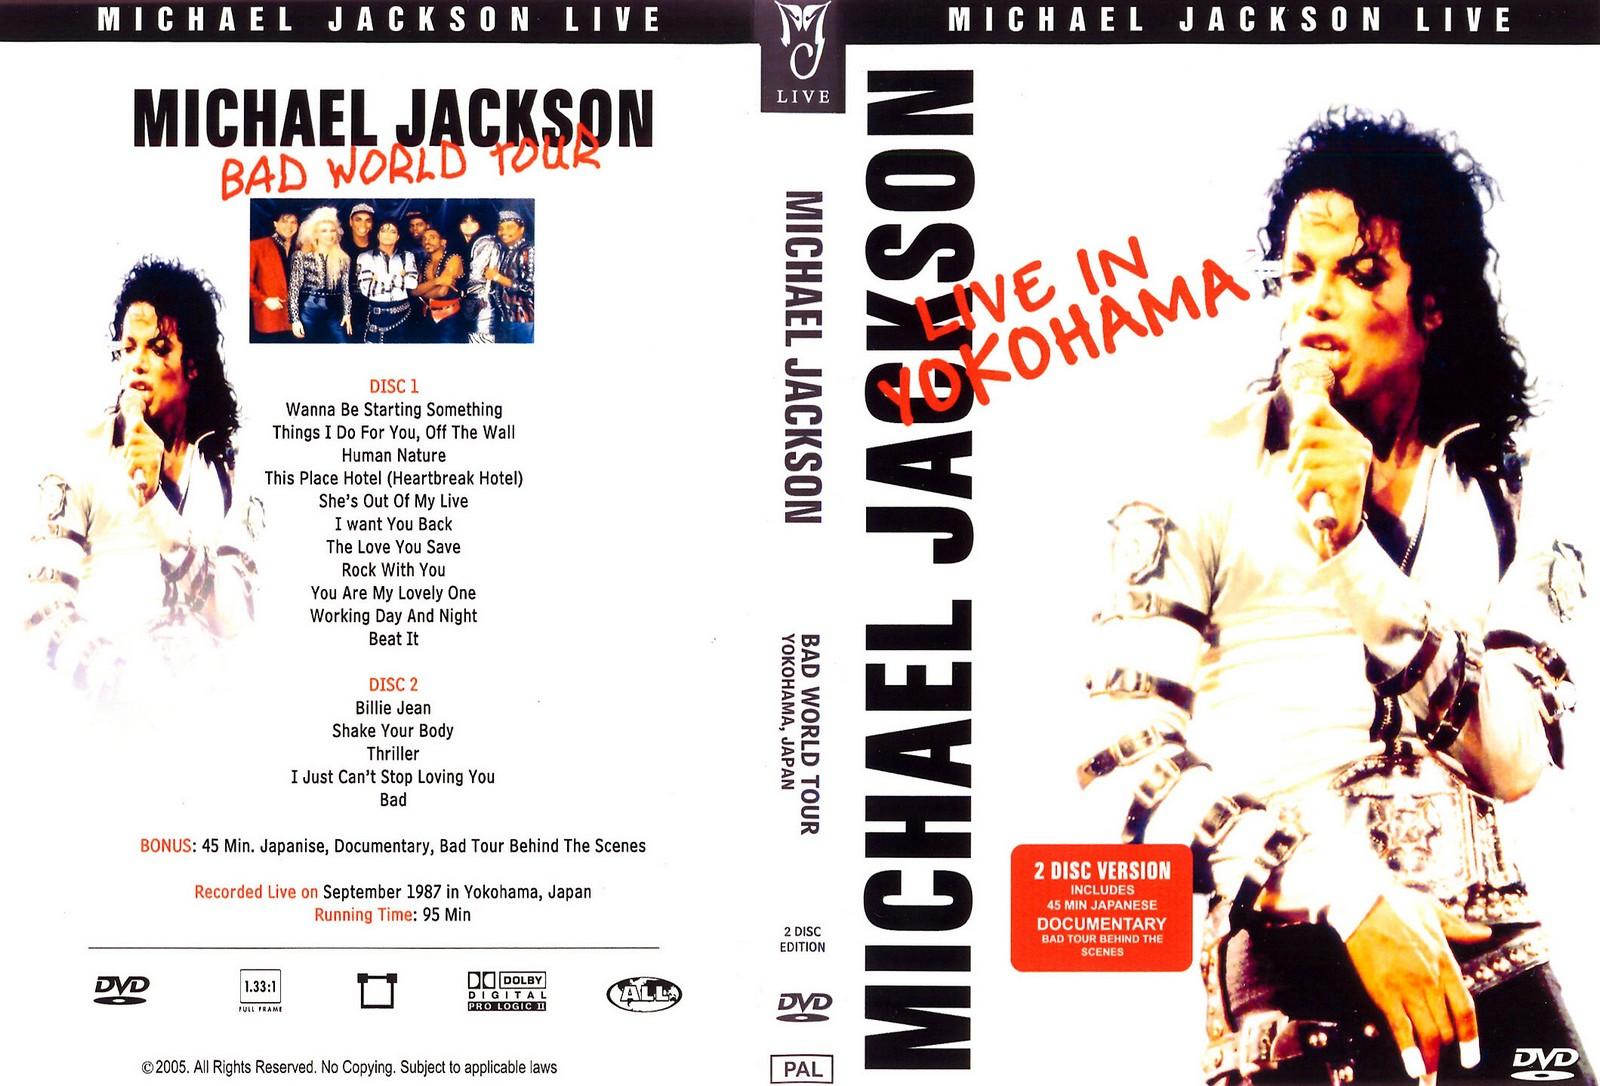 http://2.bp.blogspot.com/_brcl7Spzbn4/S-qm-mFD3PI/AAAAAAAAAL0/SwsolzO_y2A/s1600/Michael-Jackson-Bad-World-Tour-Live-In-Yokohama.jpg